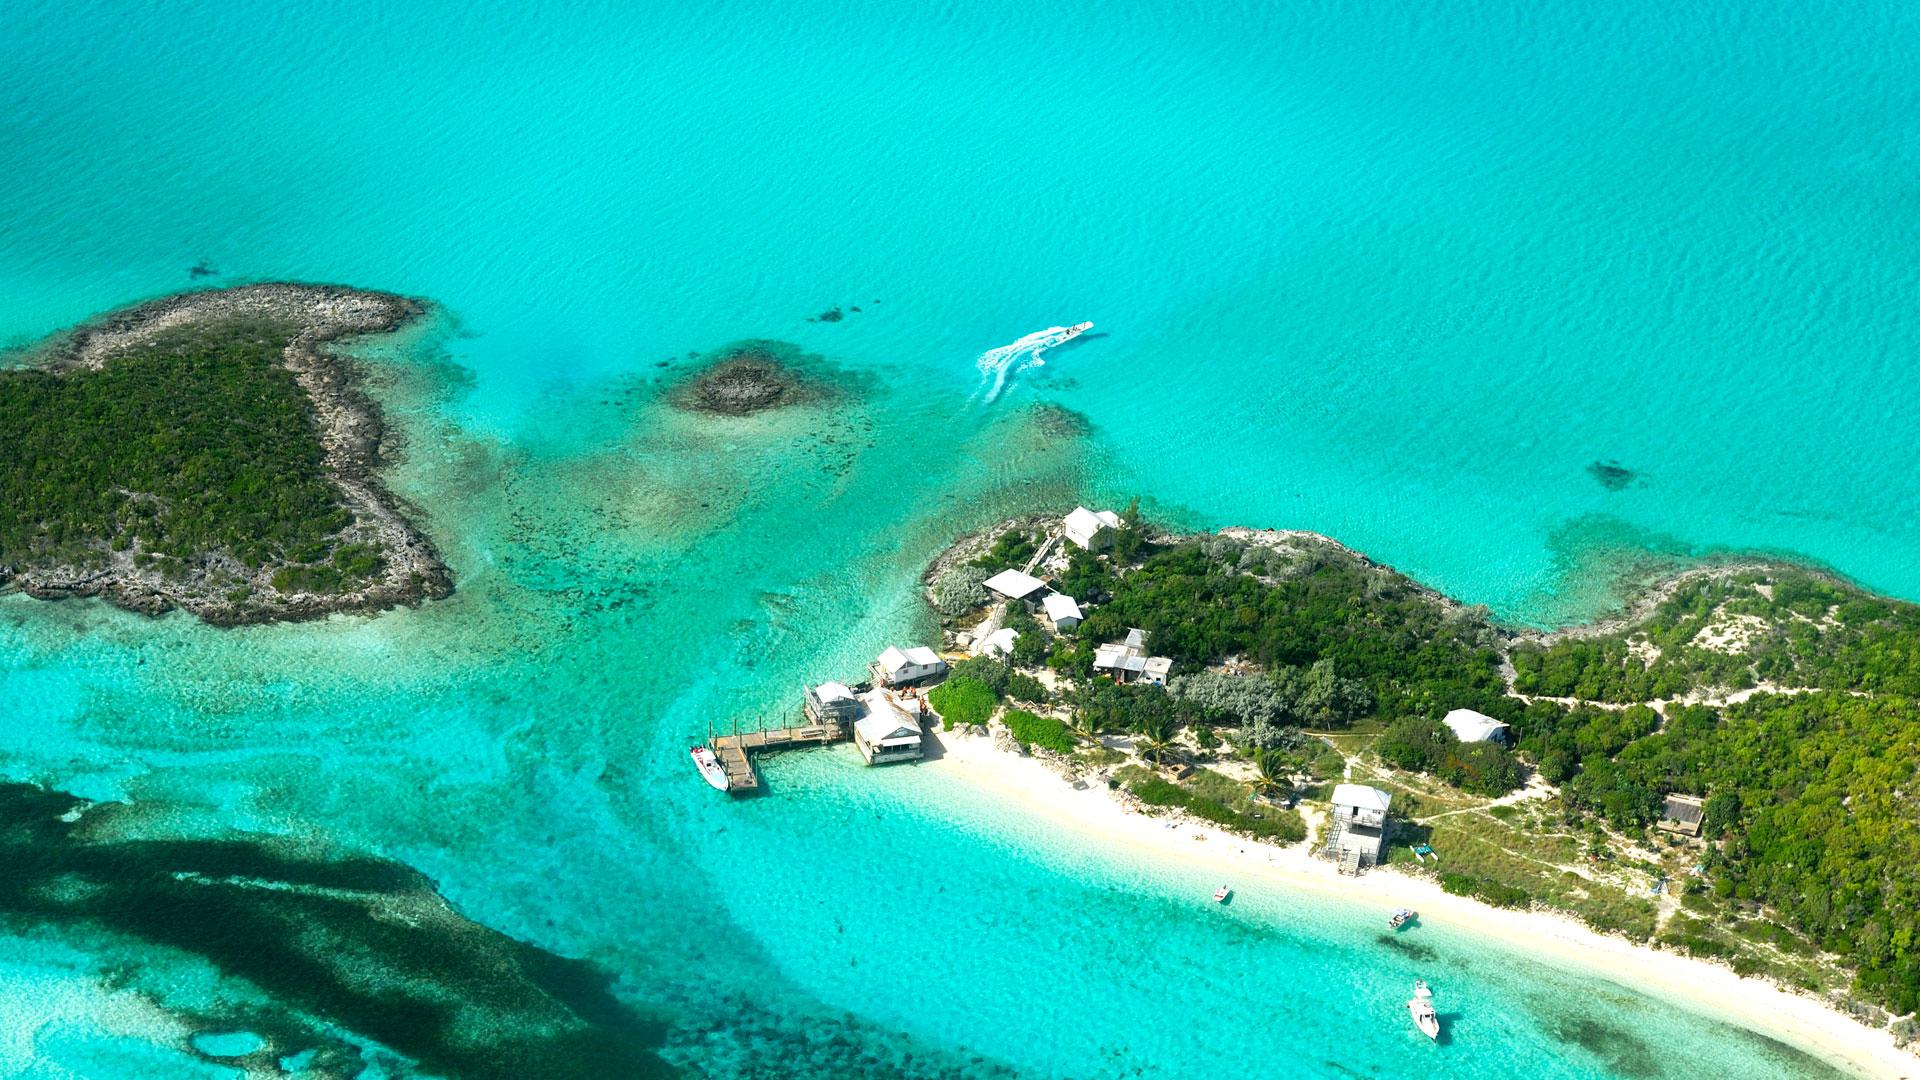 Imagen del archipiélago de Las Bahamas